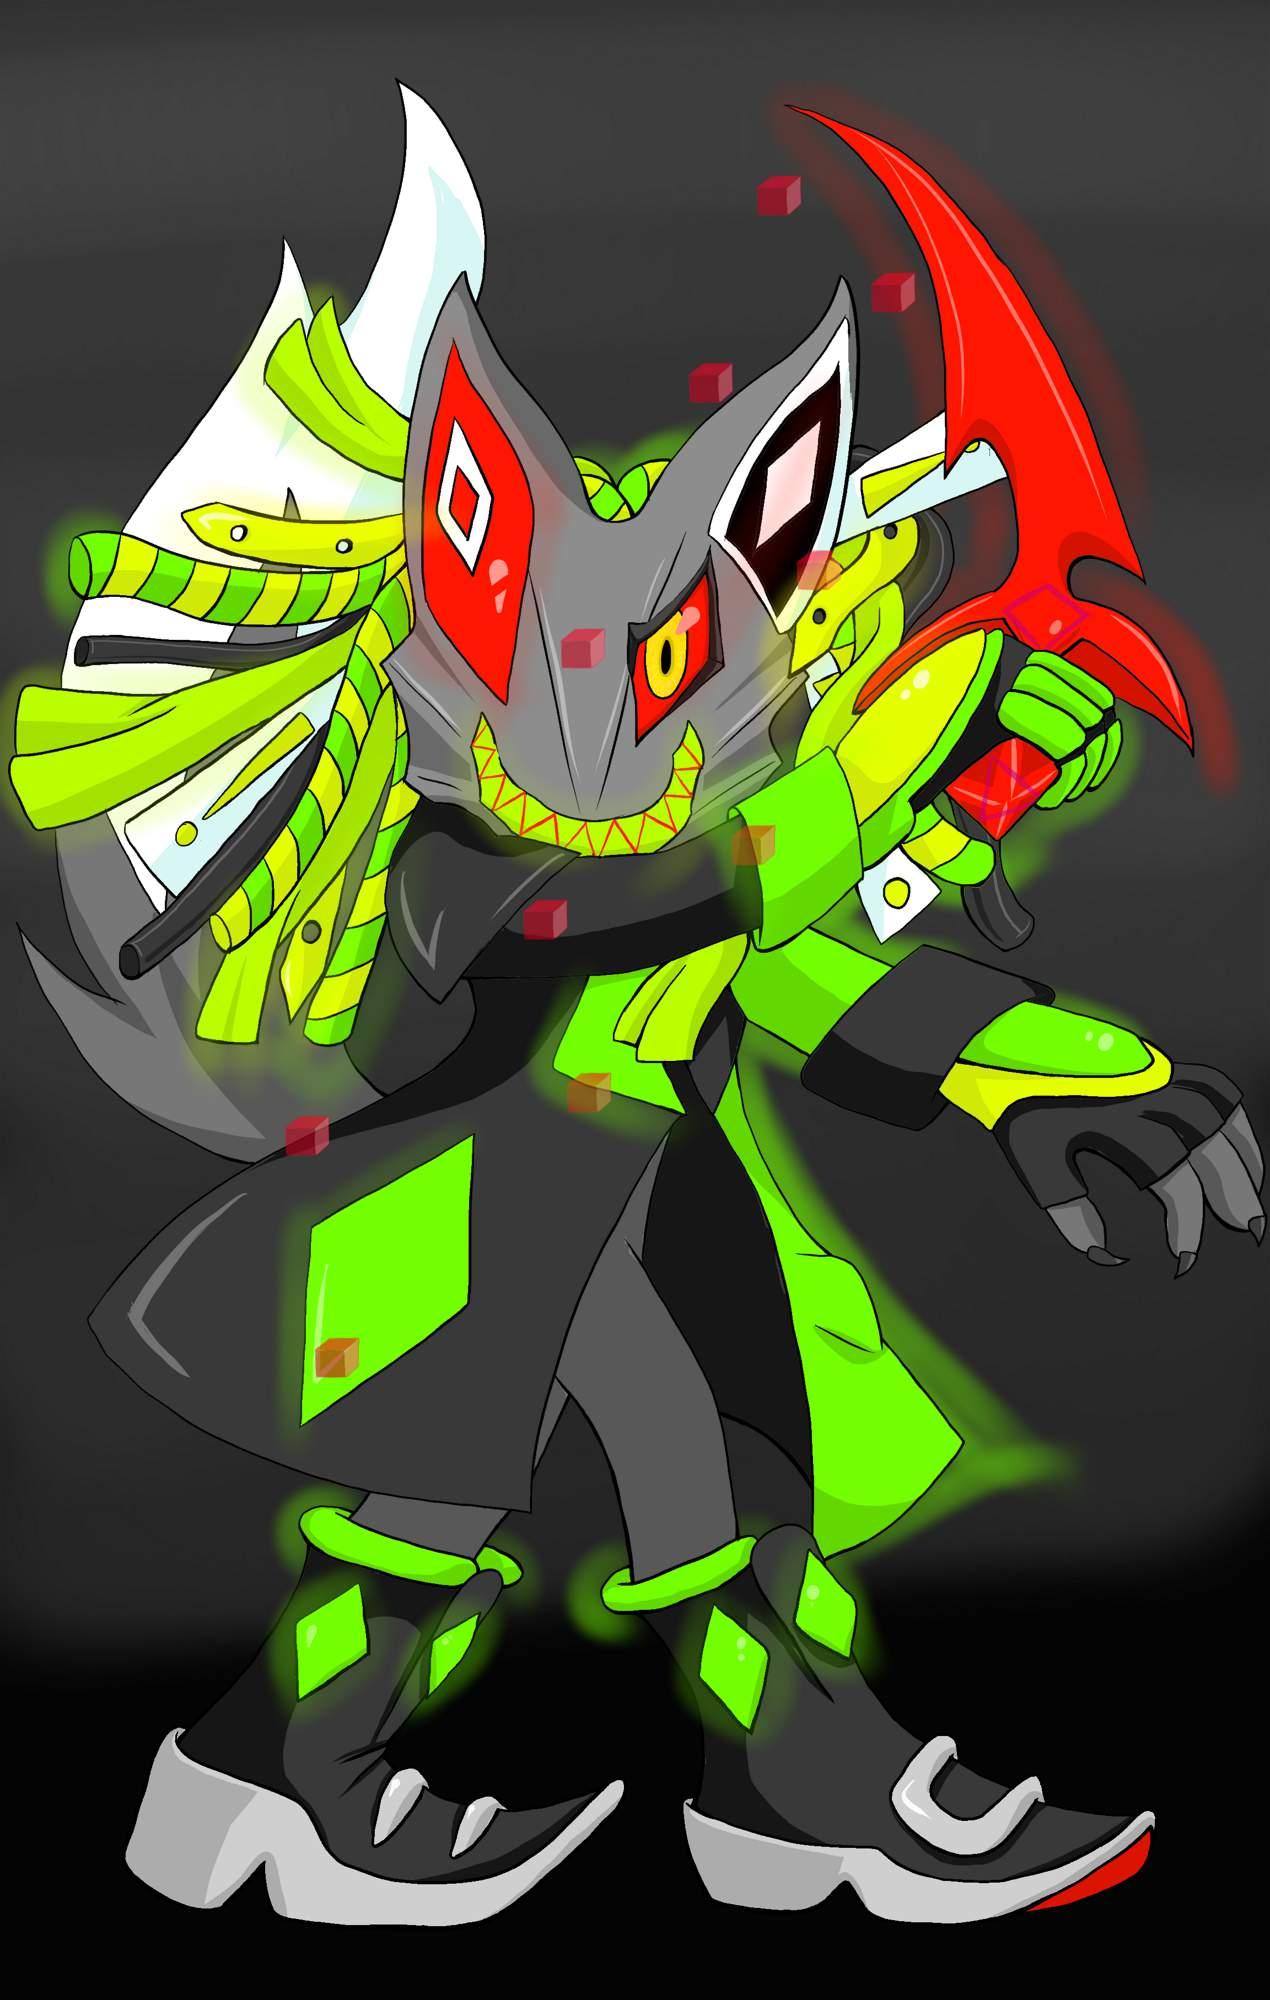 Neon Mobius Au Infinite Redesign Picture Heavy Sonic The Hedgehog Amino